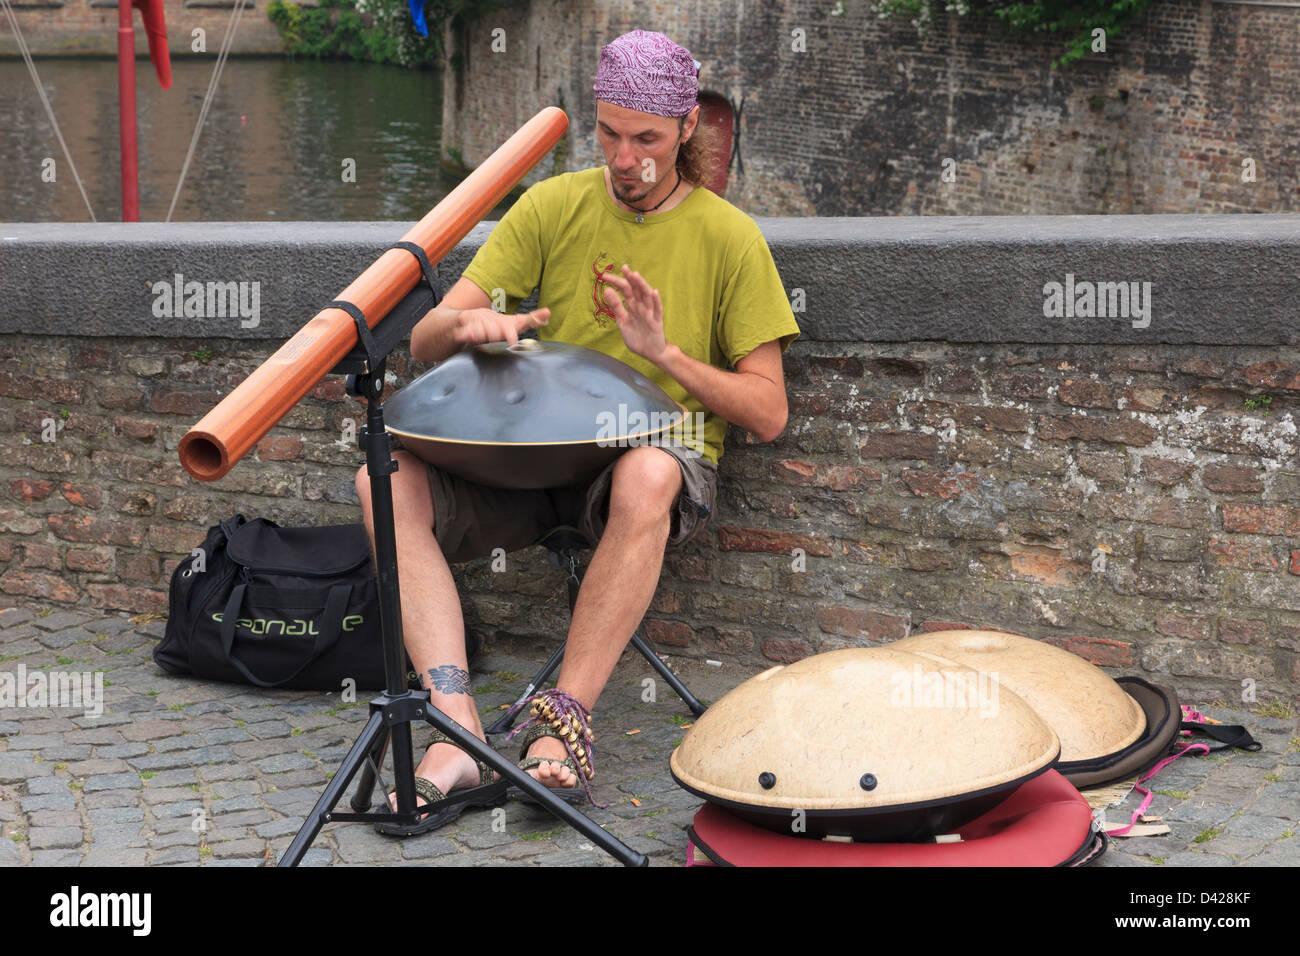 Street entertainer playing music in Bruges, East Flanders, Belgium, Europe. - Stock Image